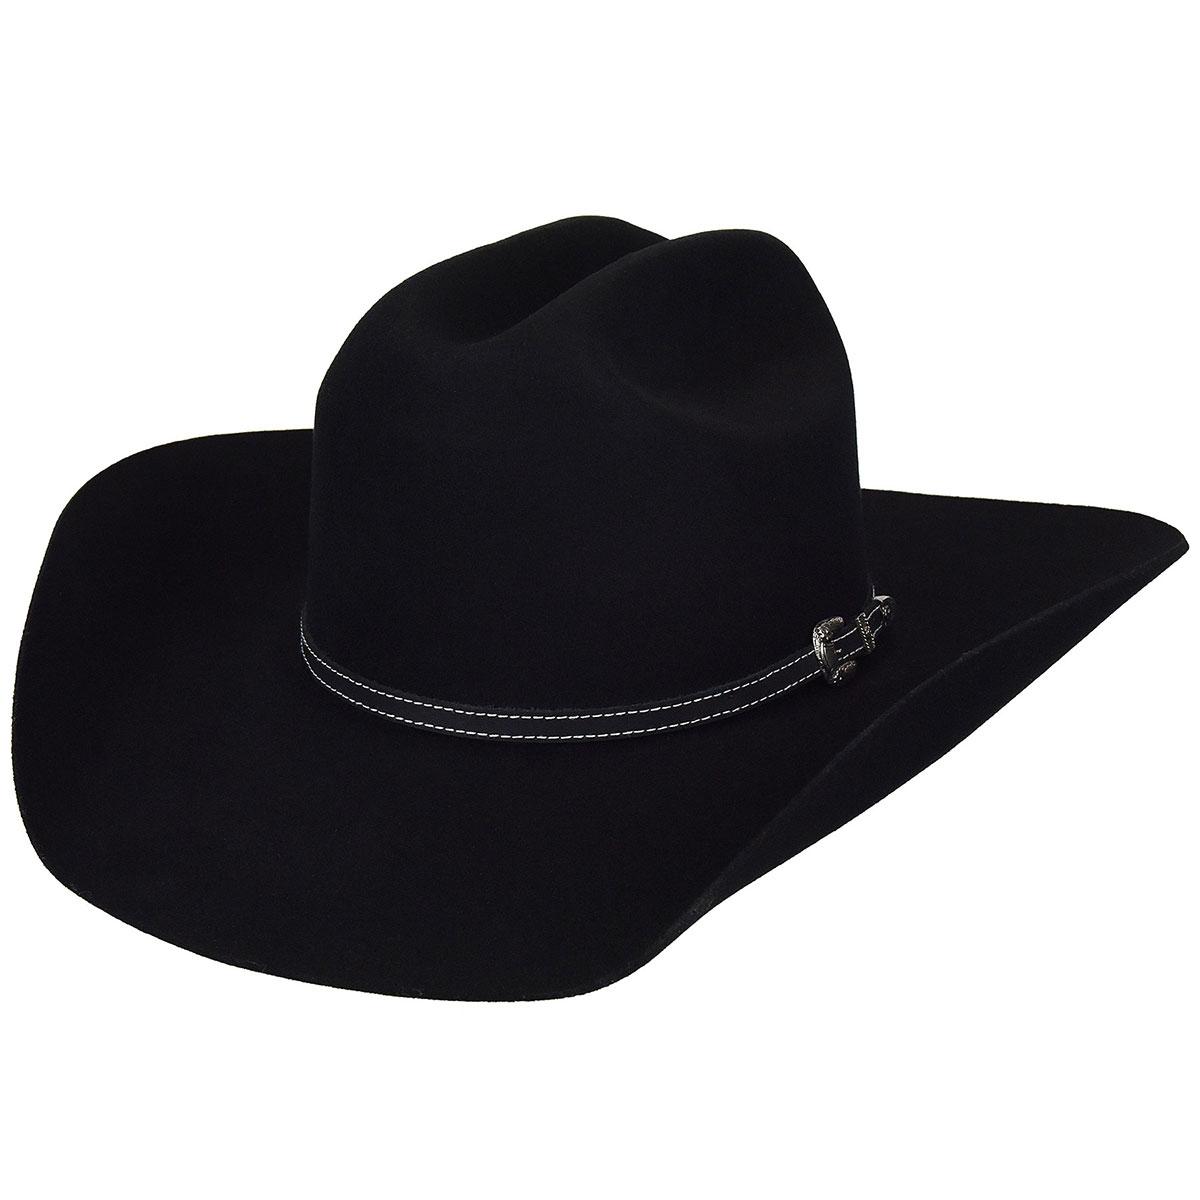 Traveller 2X Western Hat - Black/6 5/8